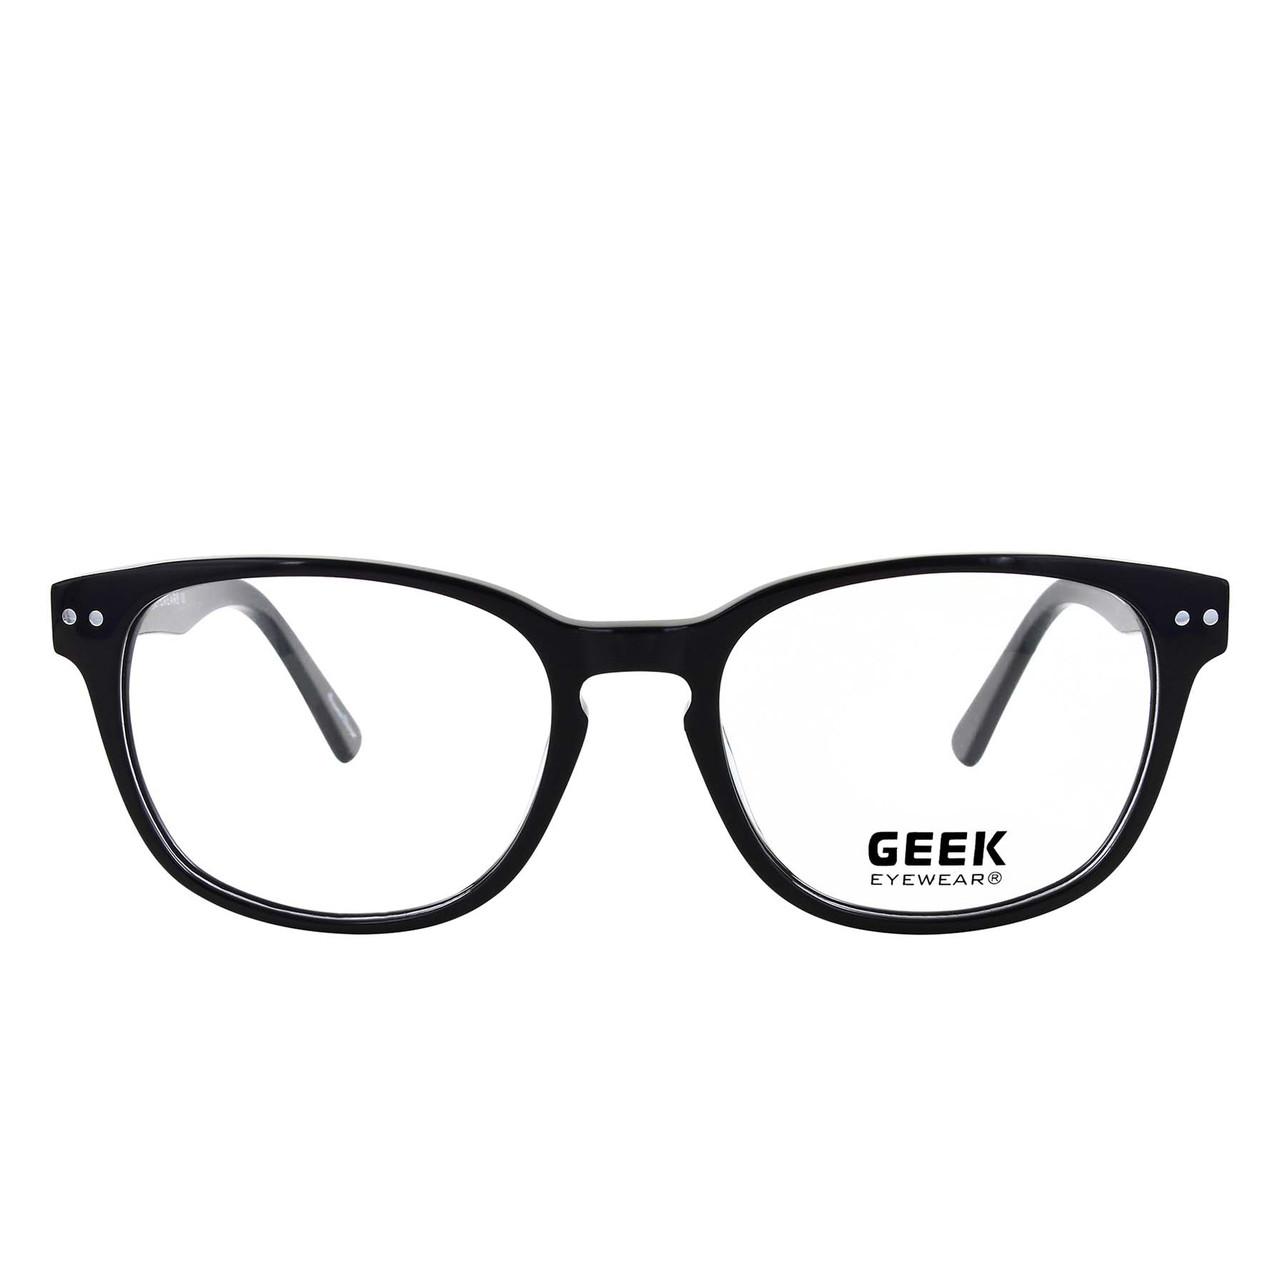 GEEK Eyewear GEEK NINJA